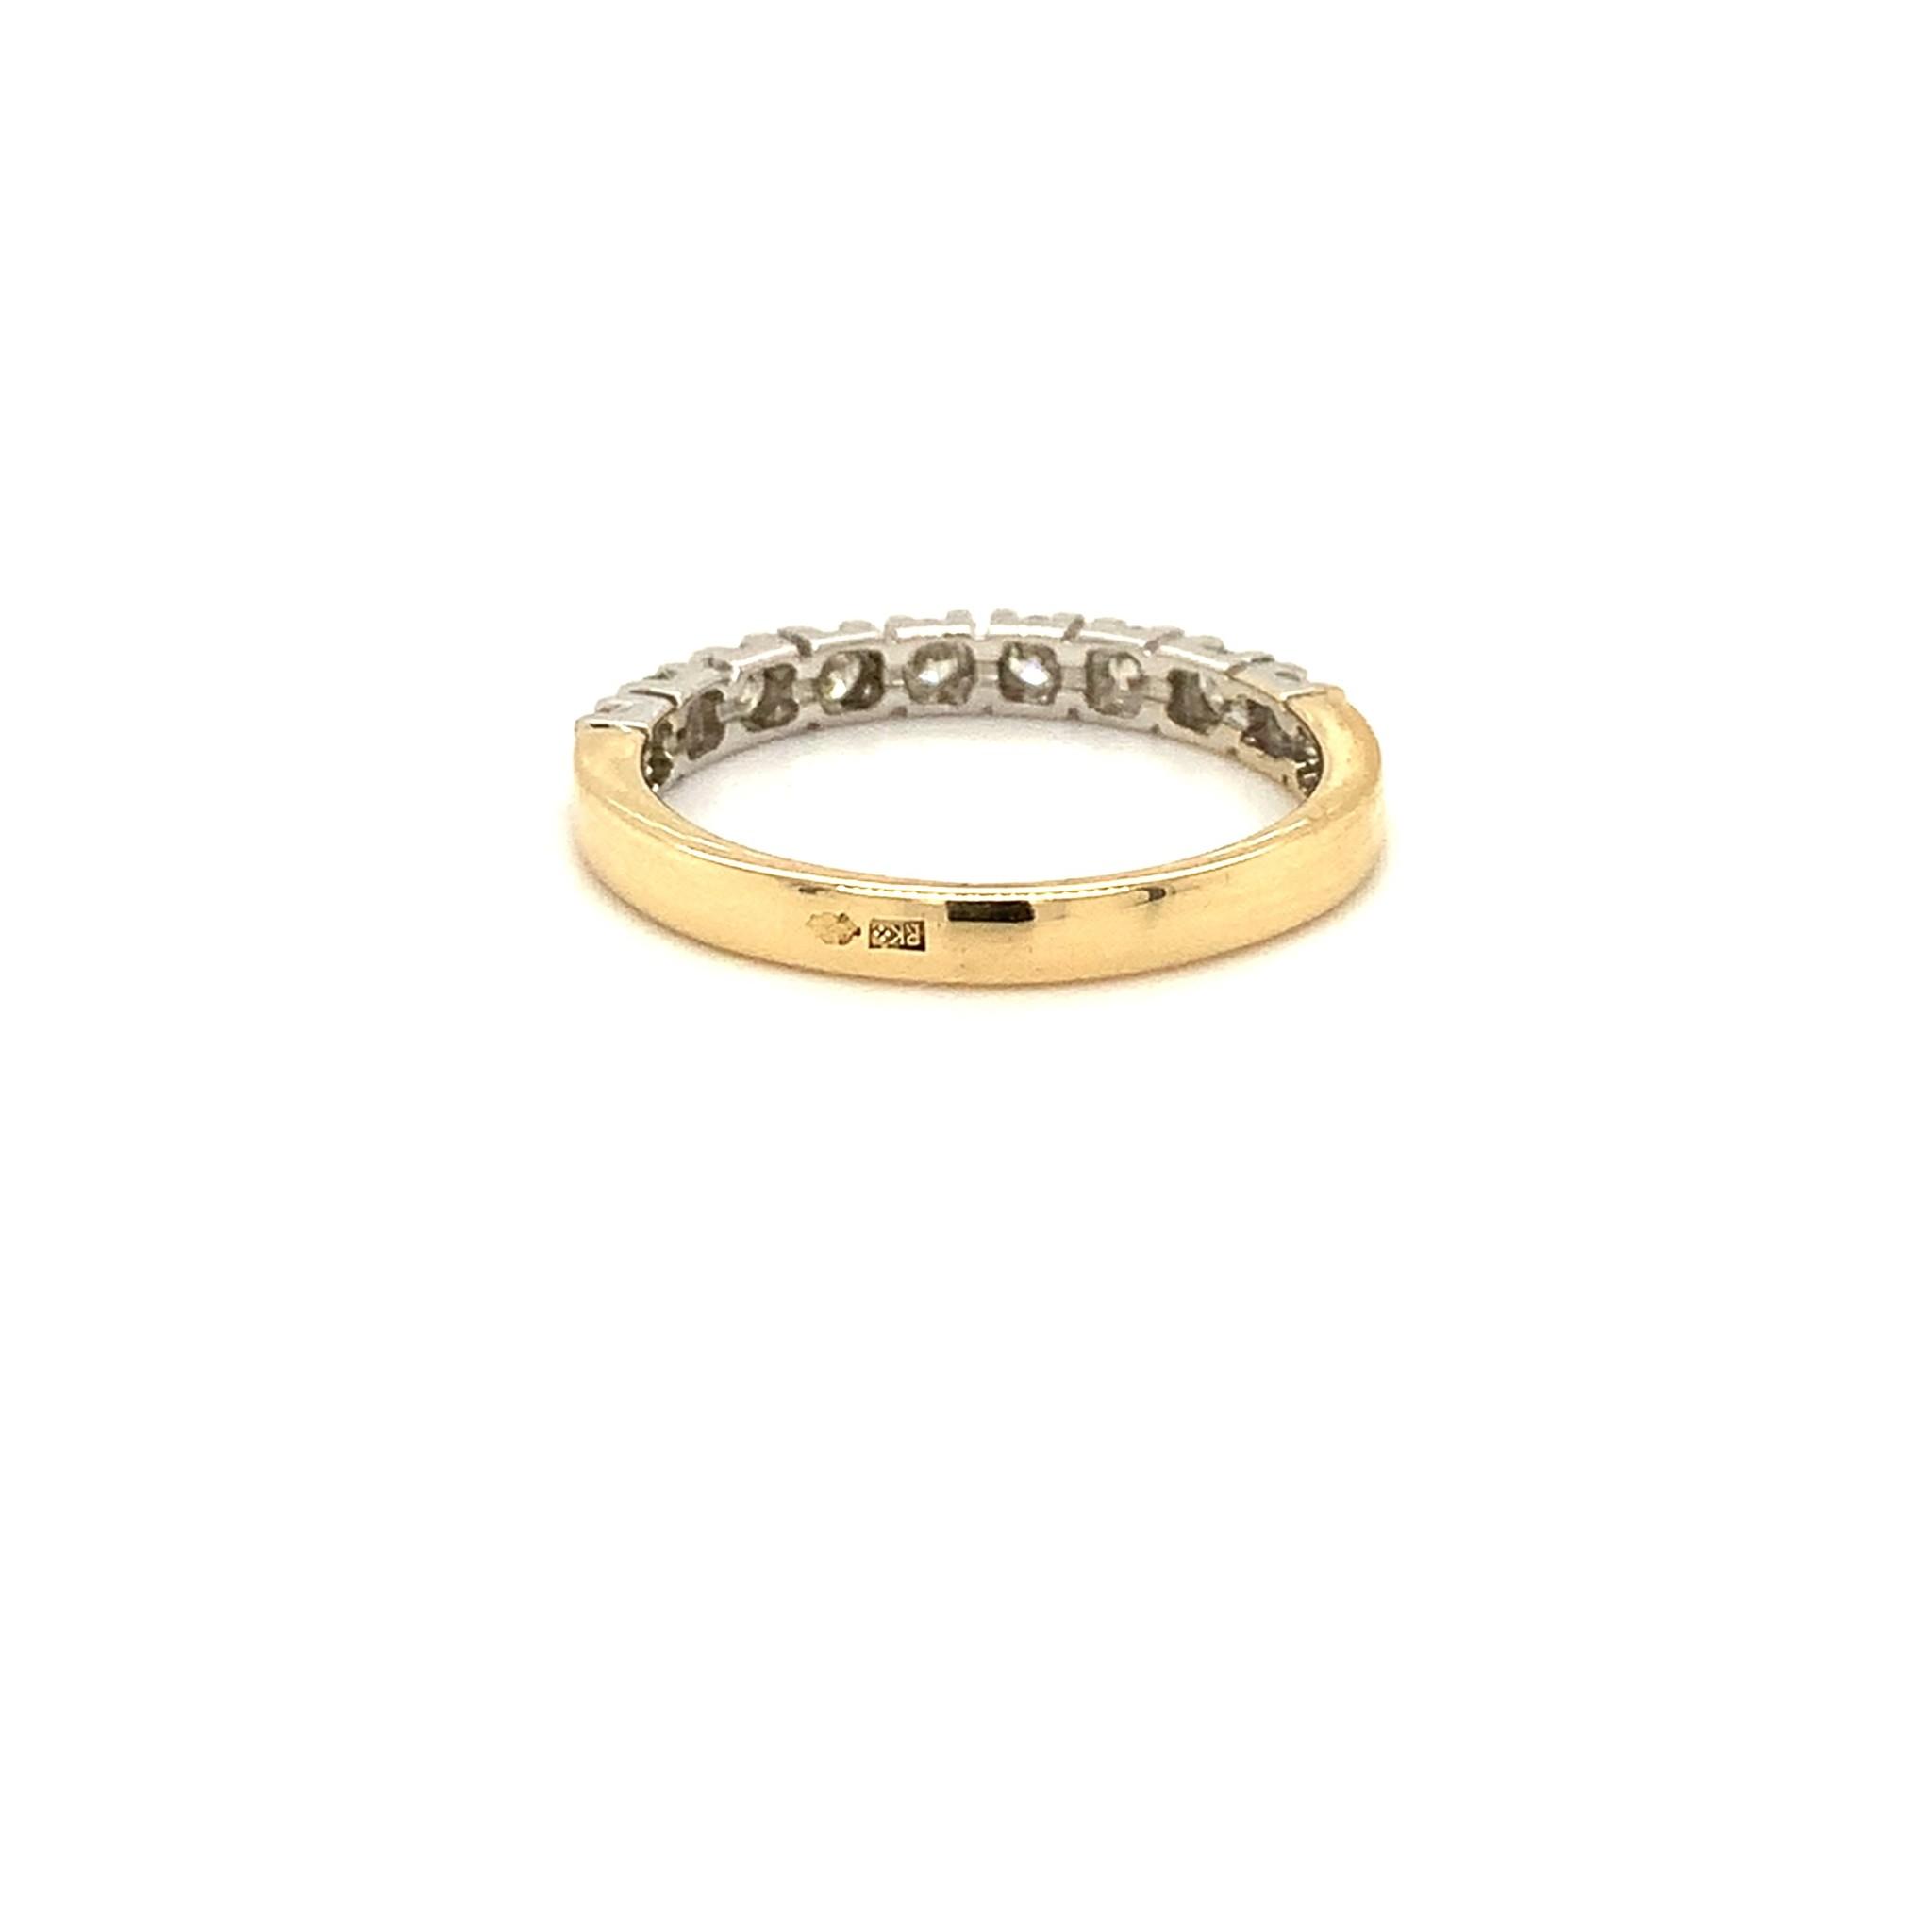 ROEMER ROEMER bicolor gouden ring met diamant